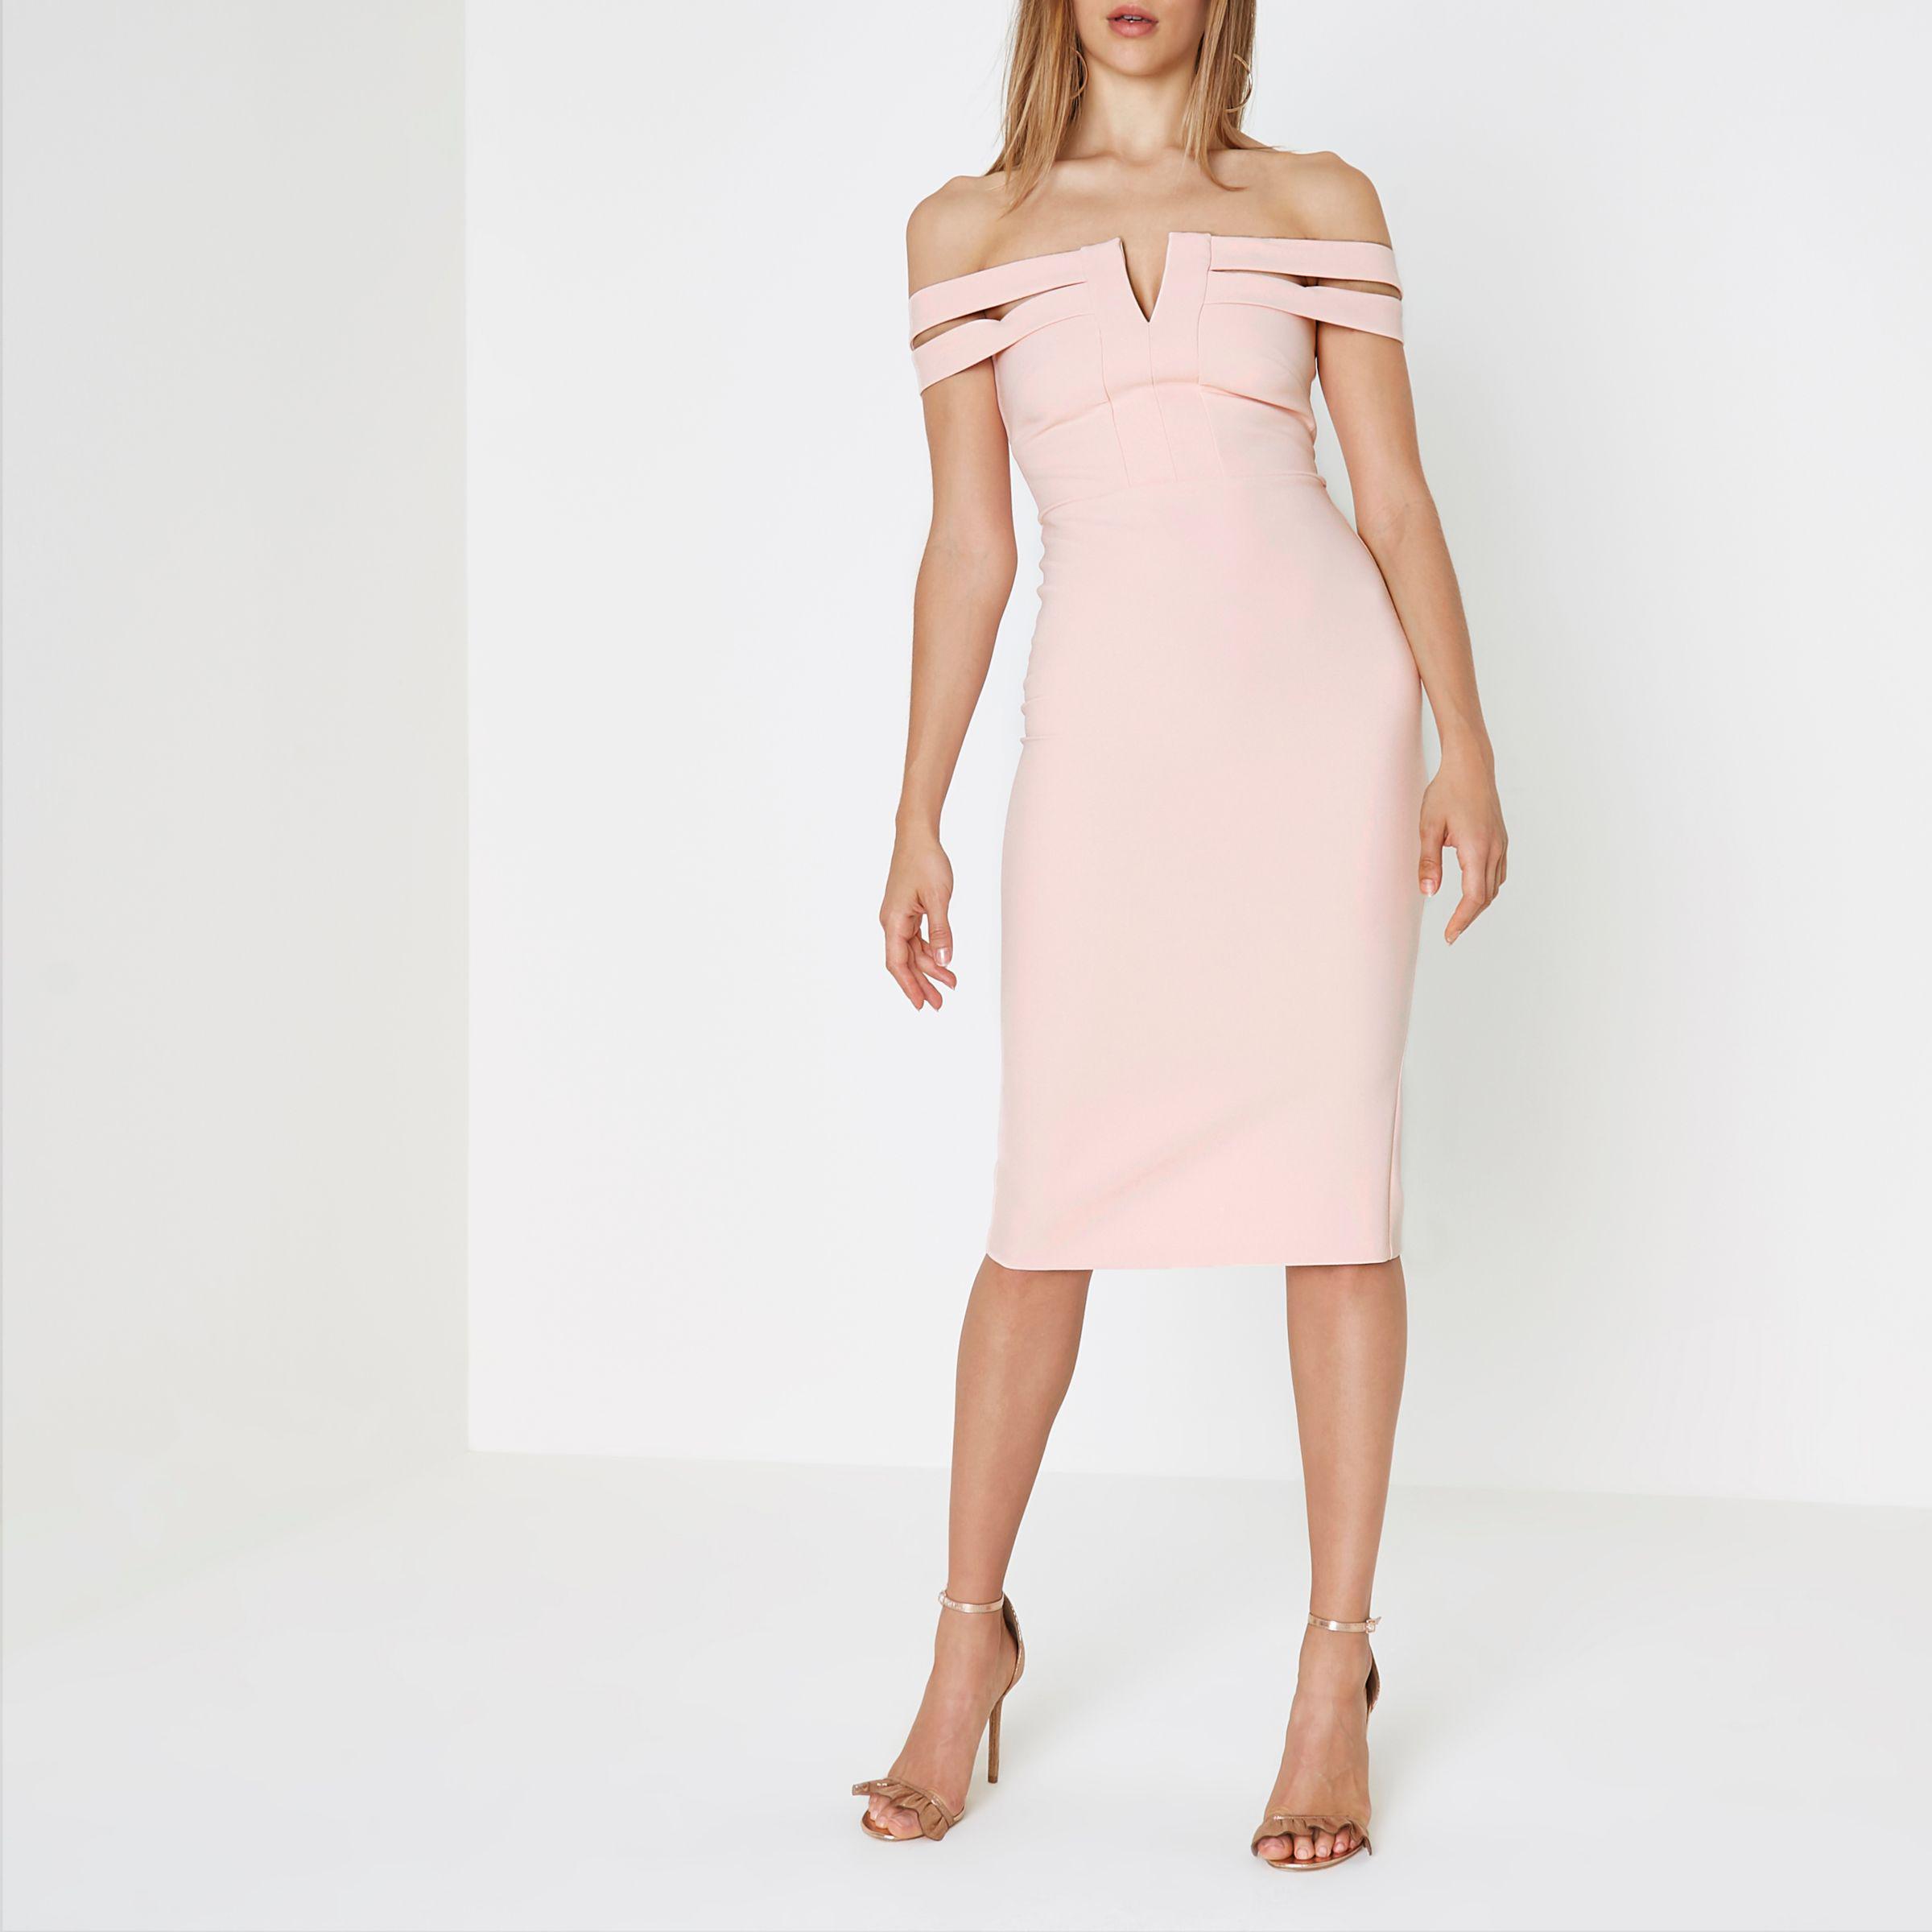 River dress pink bright island bodycon midi truworths